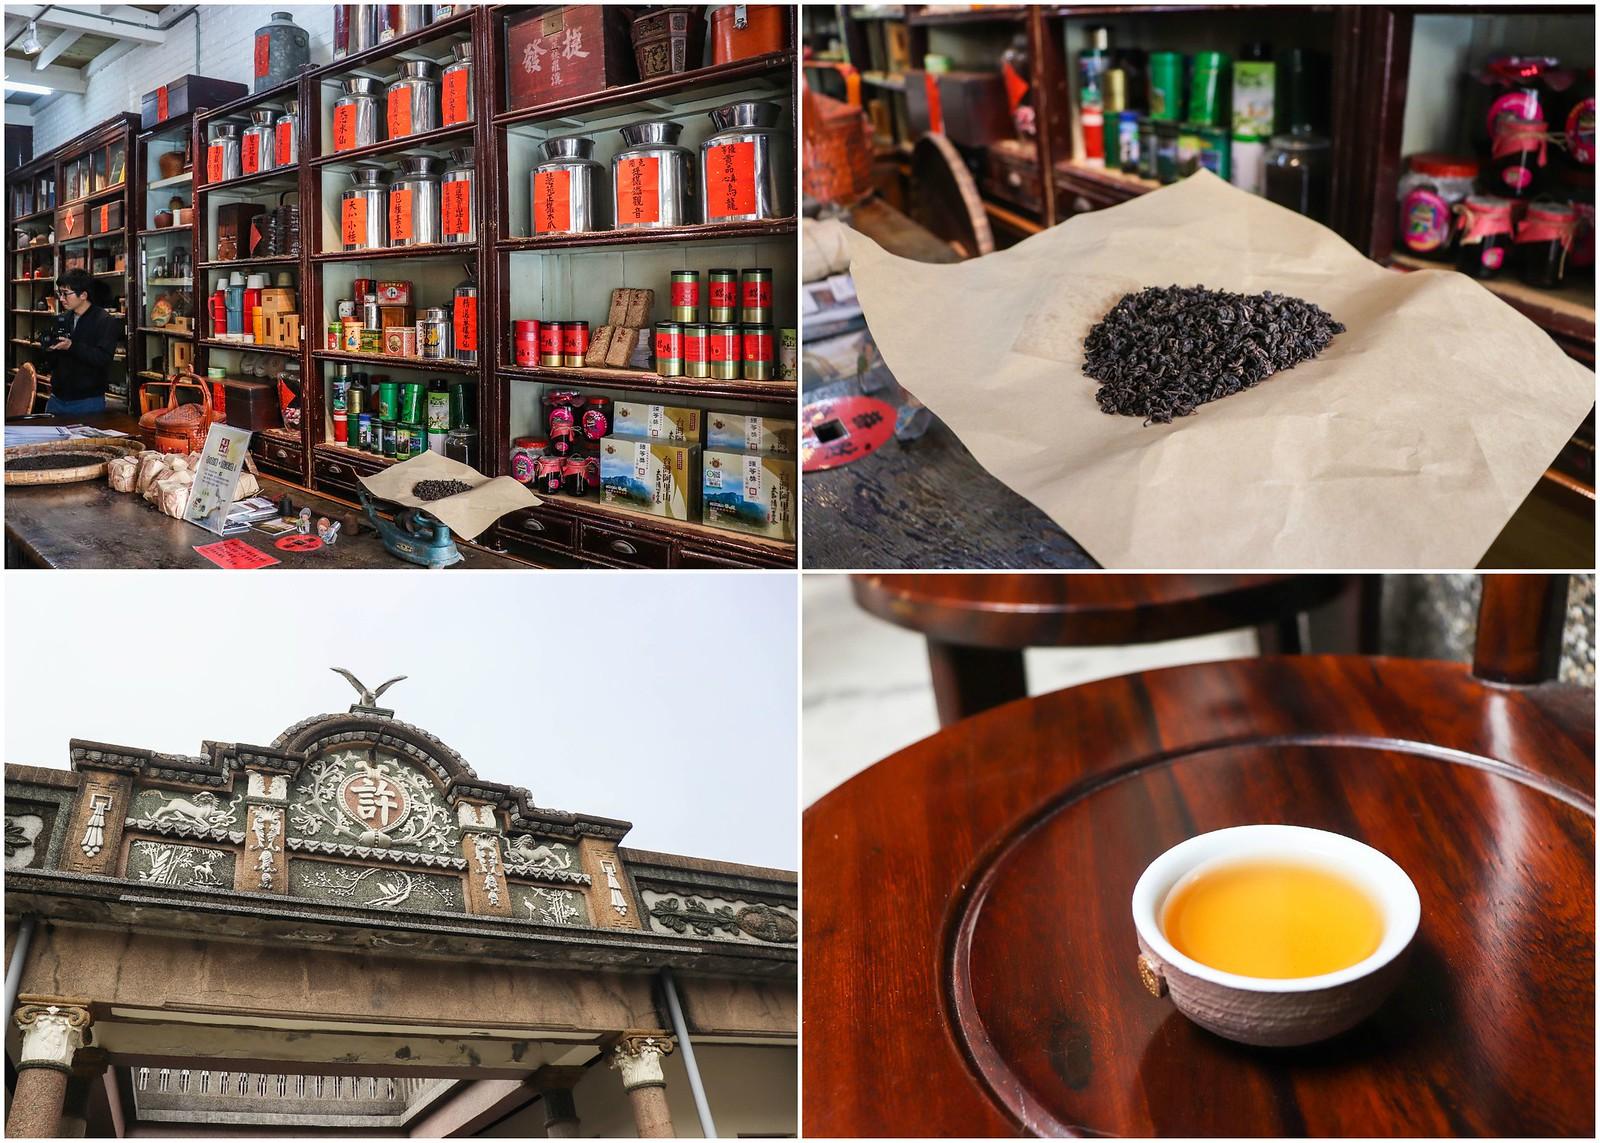 Jiefa tea shop